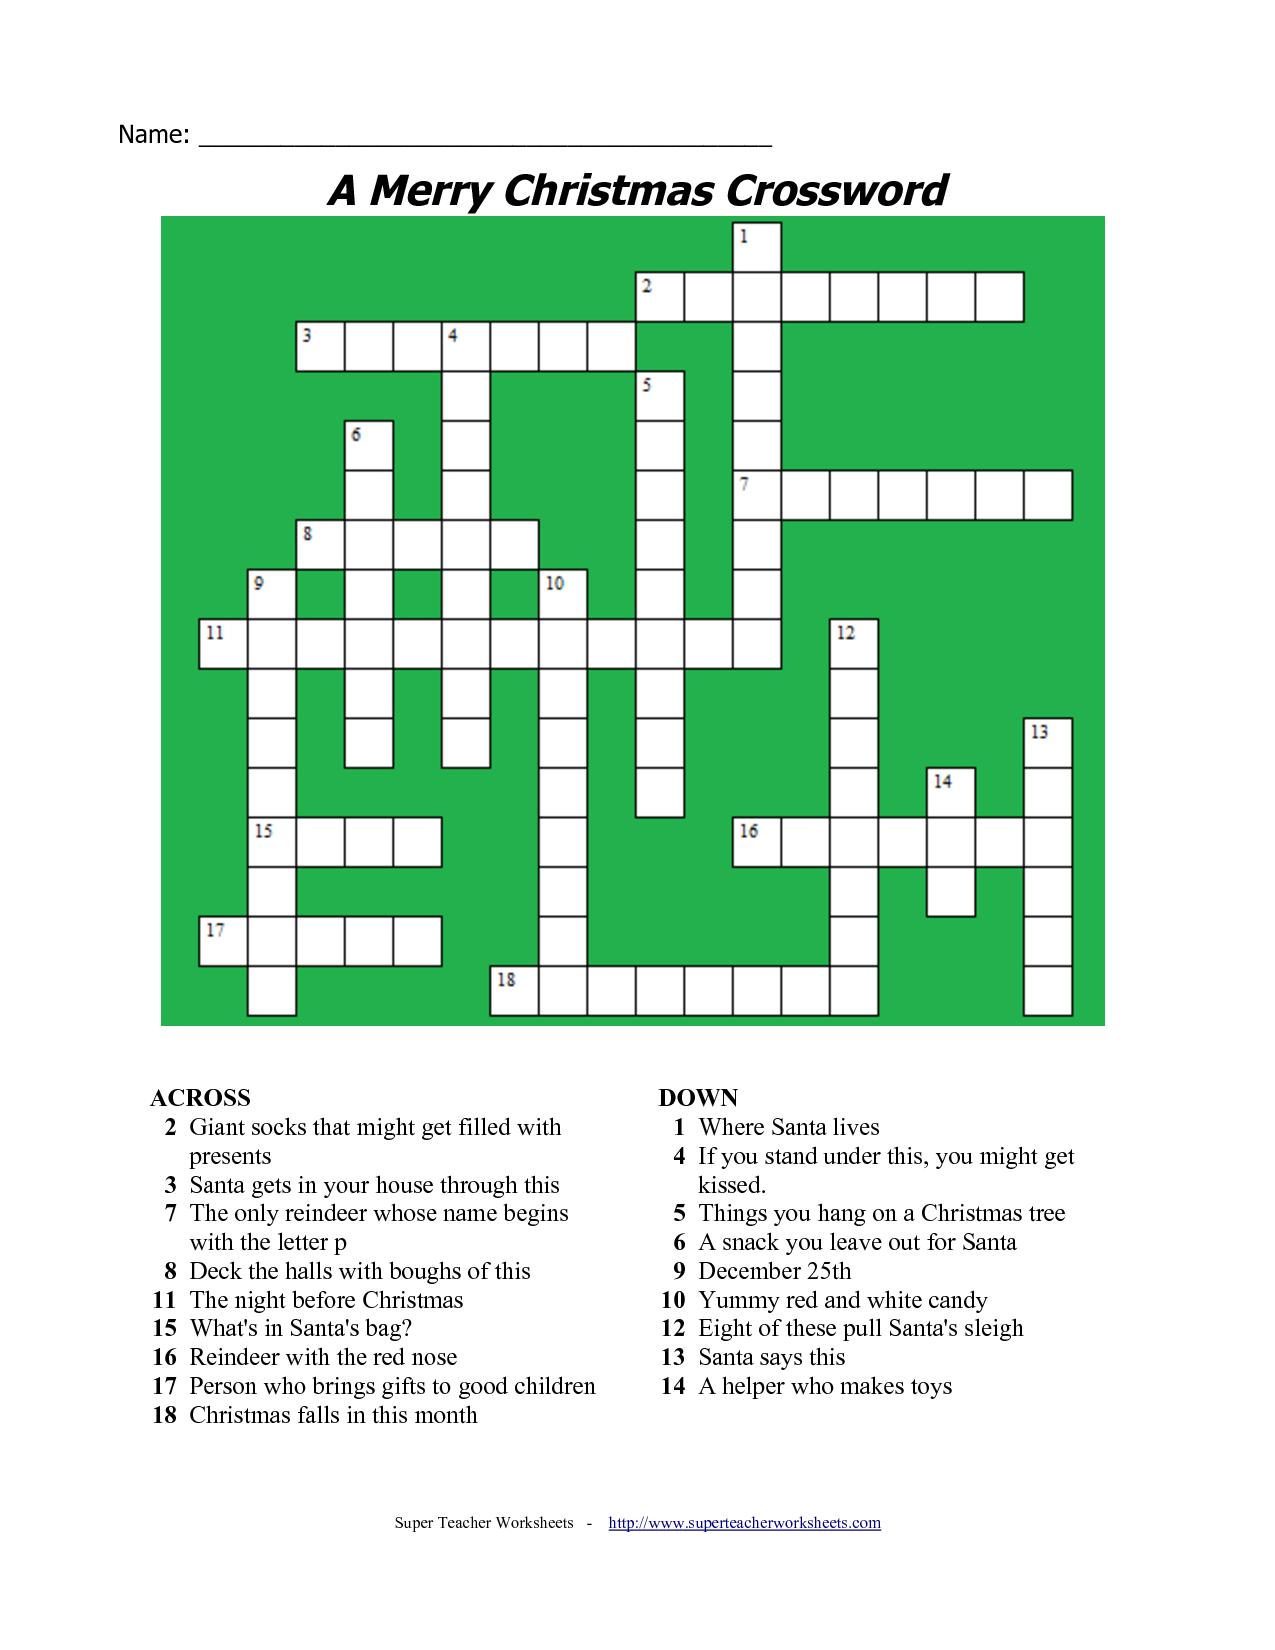 20 Fun Printable Christmas Crossword Puzzles | Kittybabylove - Printable Crossword Puzzle Christmas